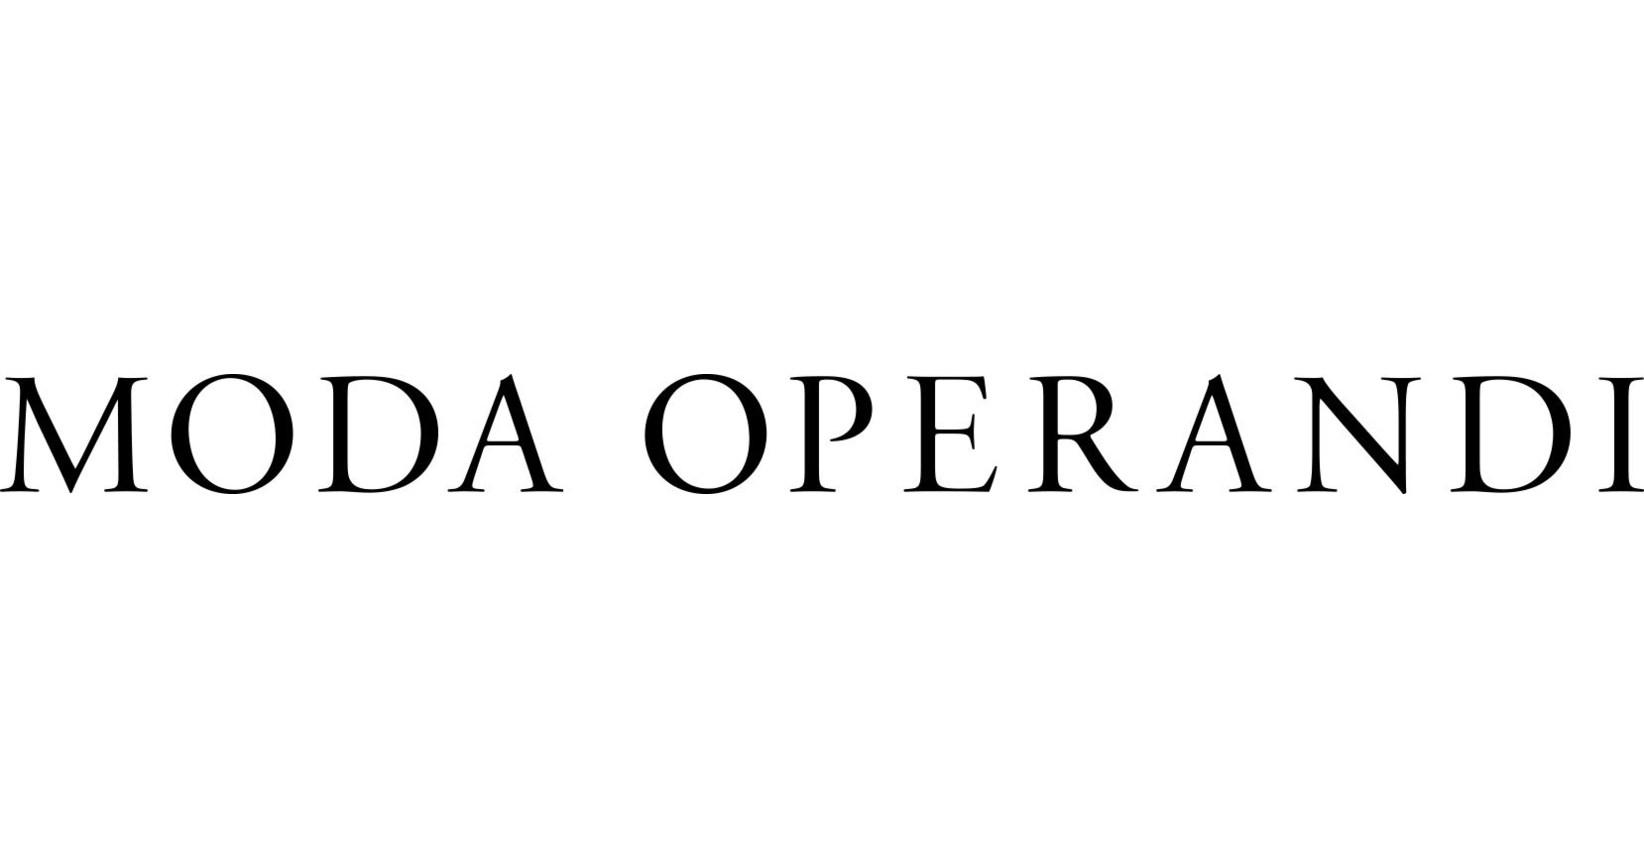 moda-operandi-logo.jpeg